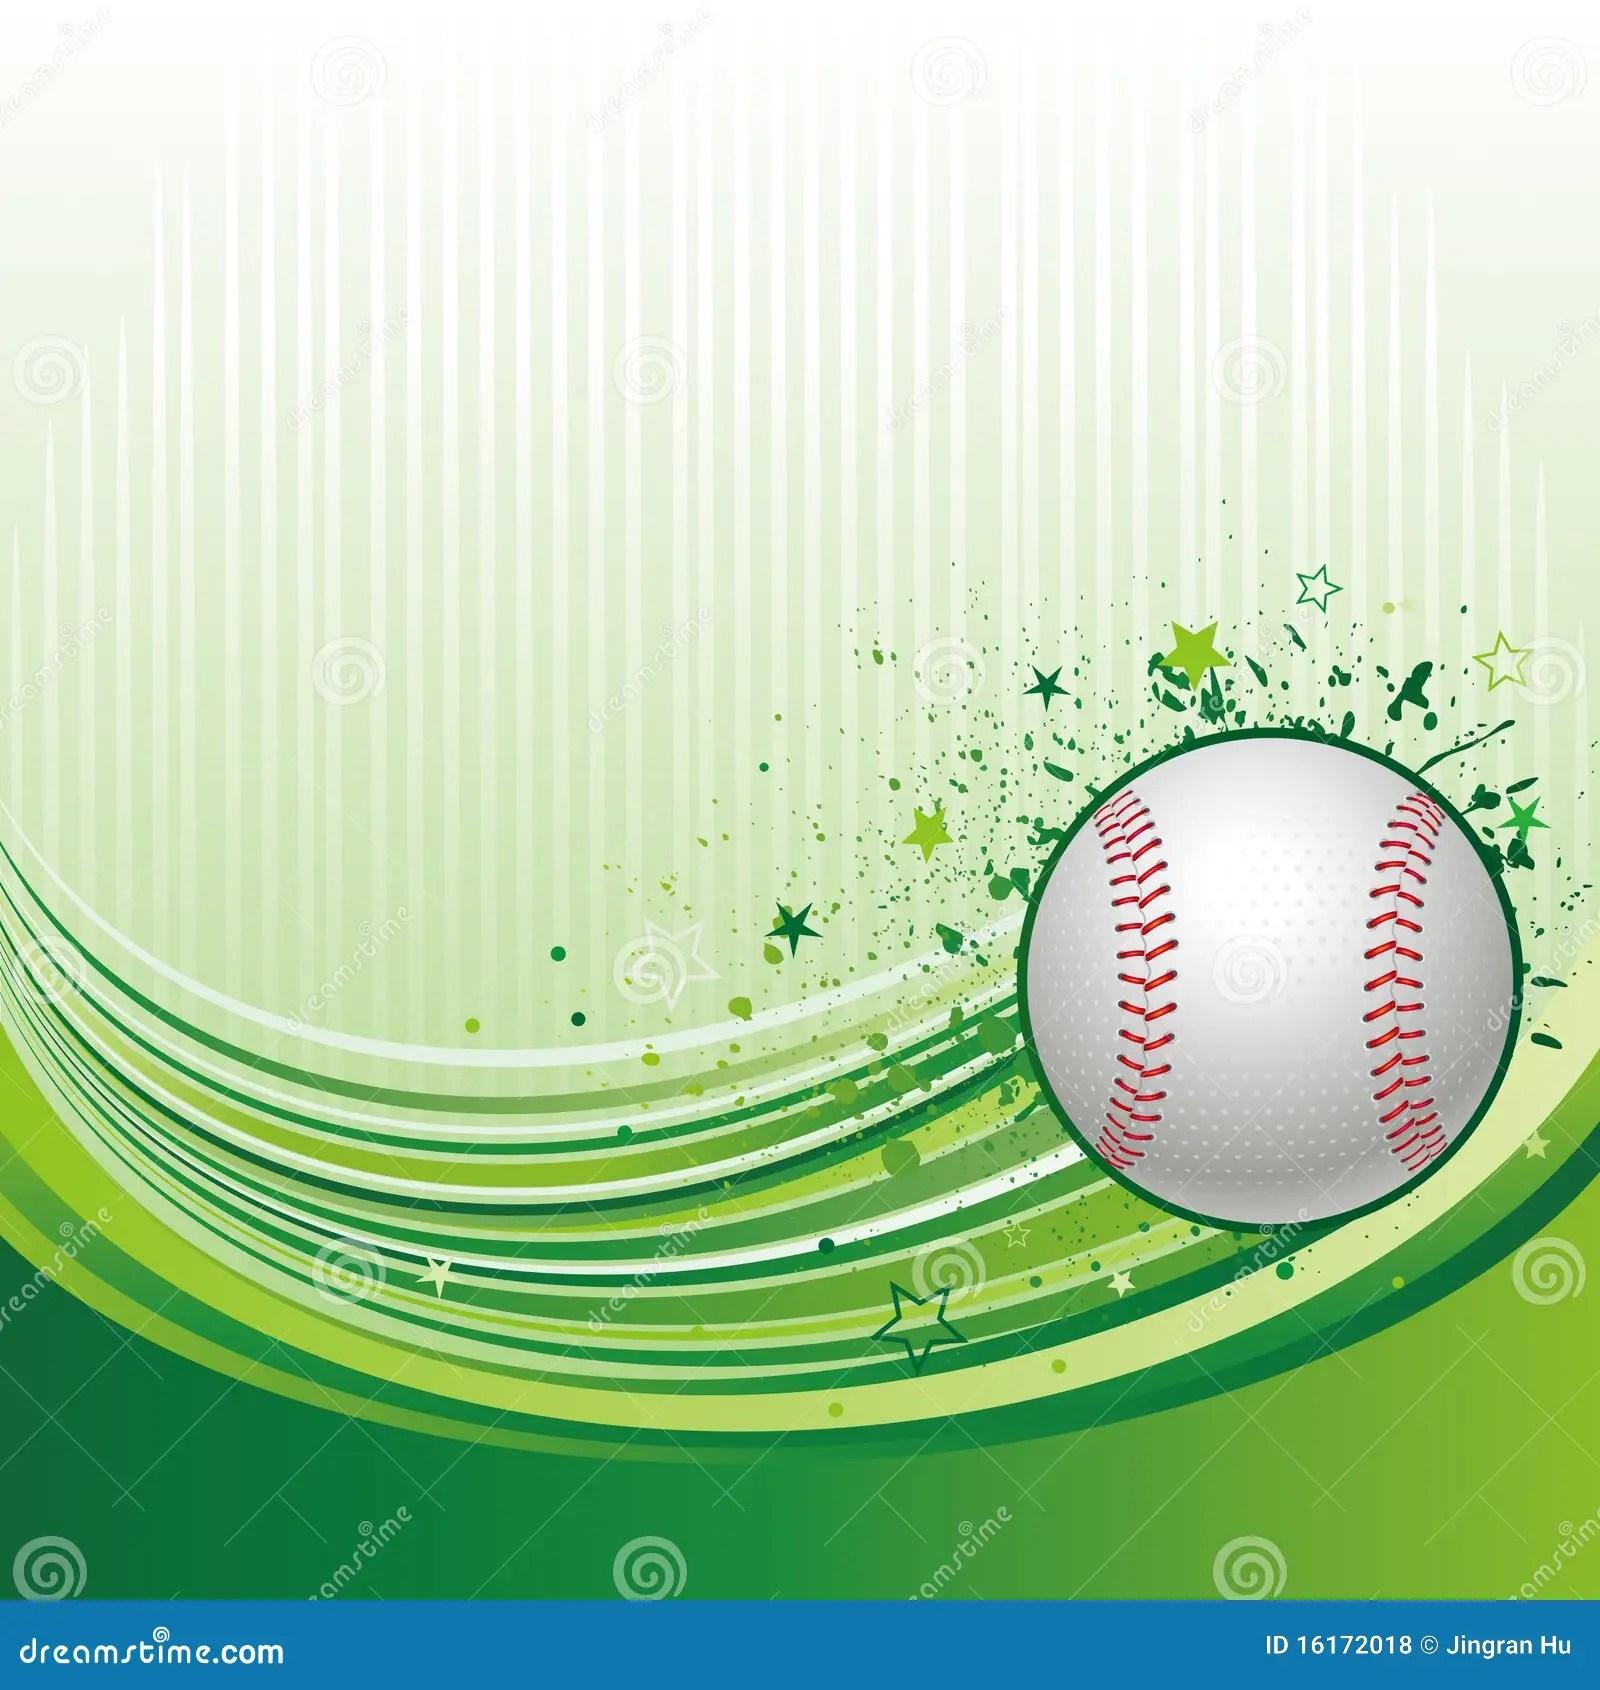 Beisbol Wallpaper 3d Baseball Background Royalty Free Stock Photos Image